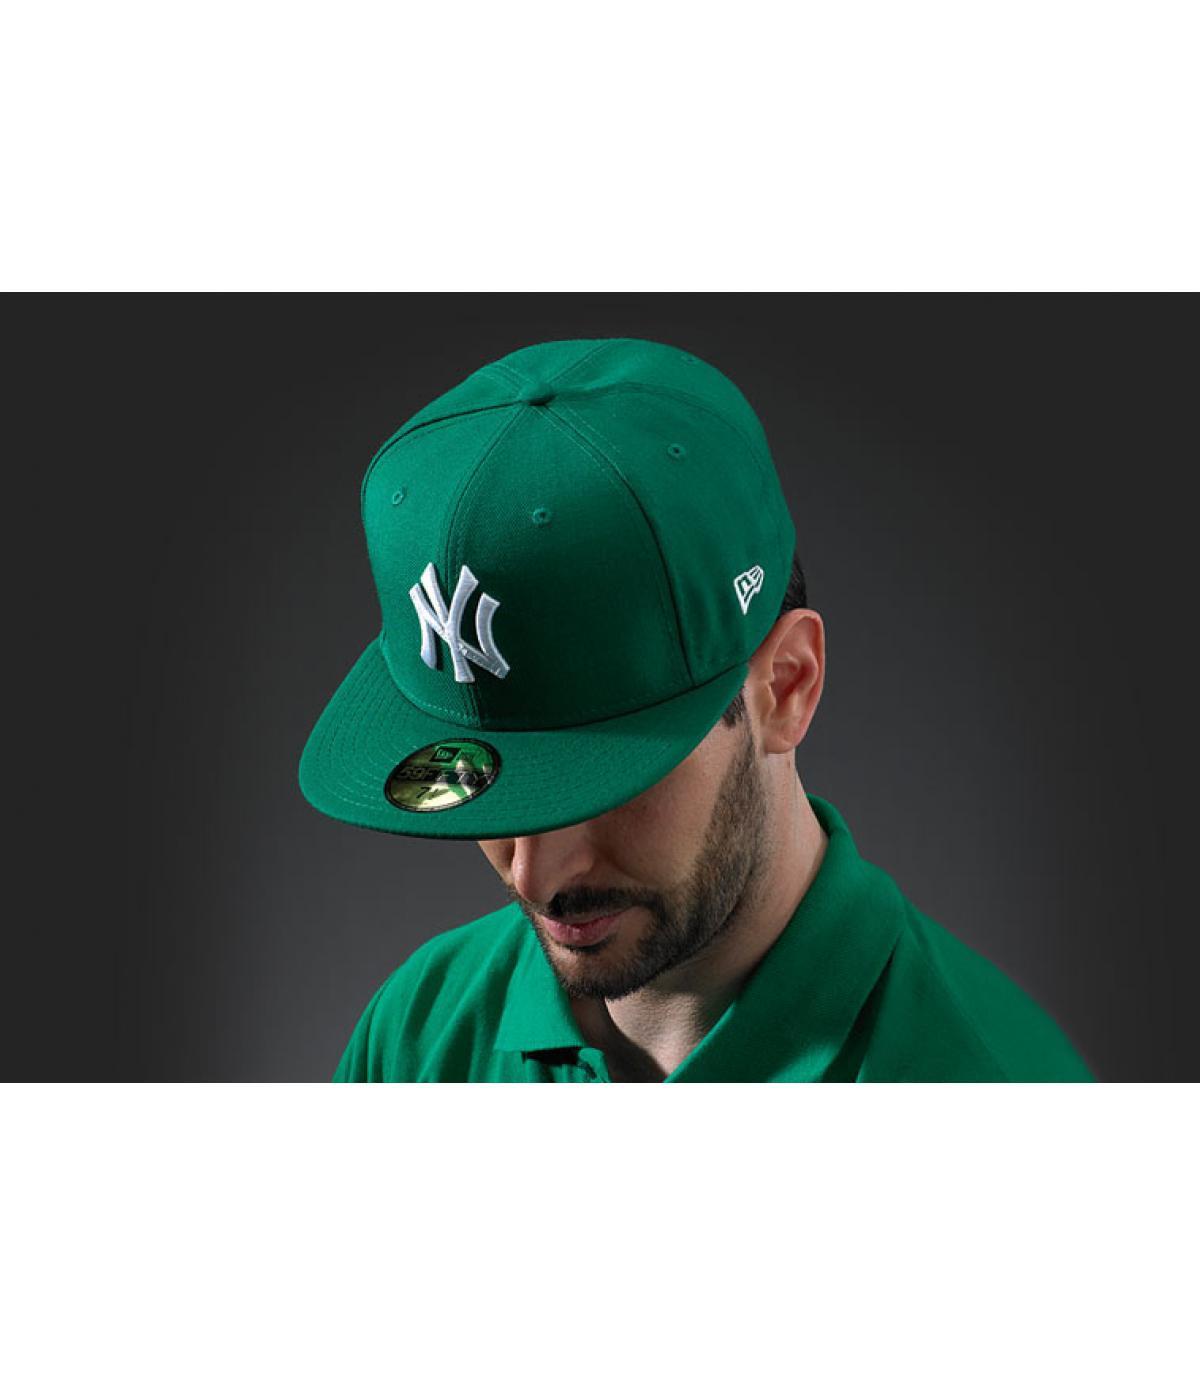 MLB Basic New York green